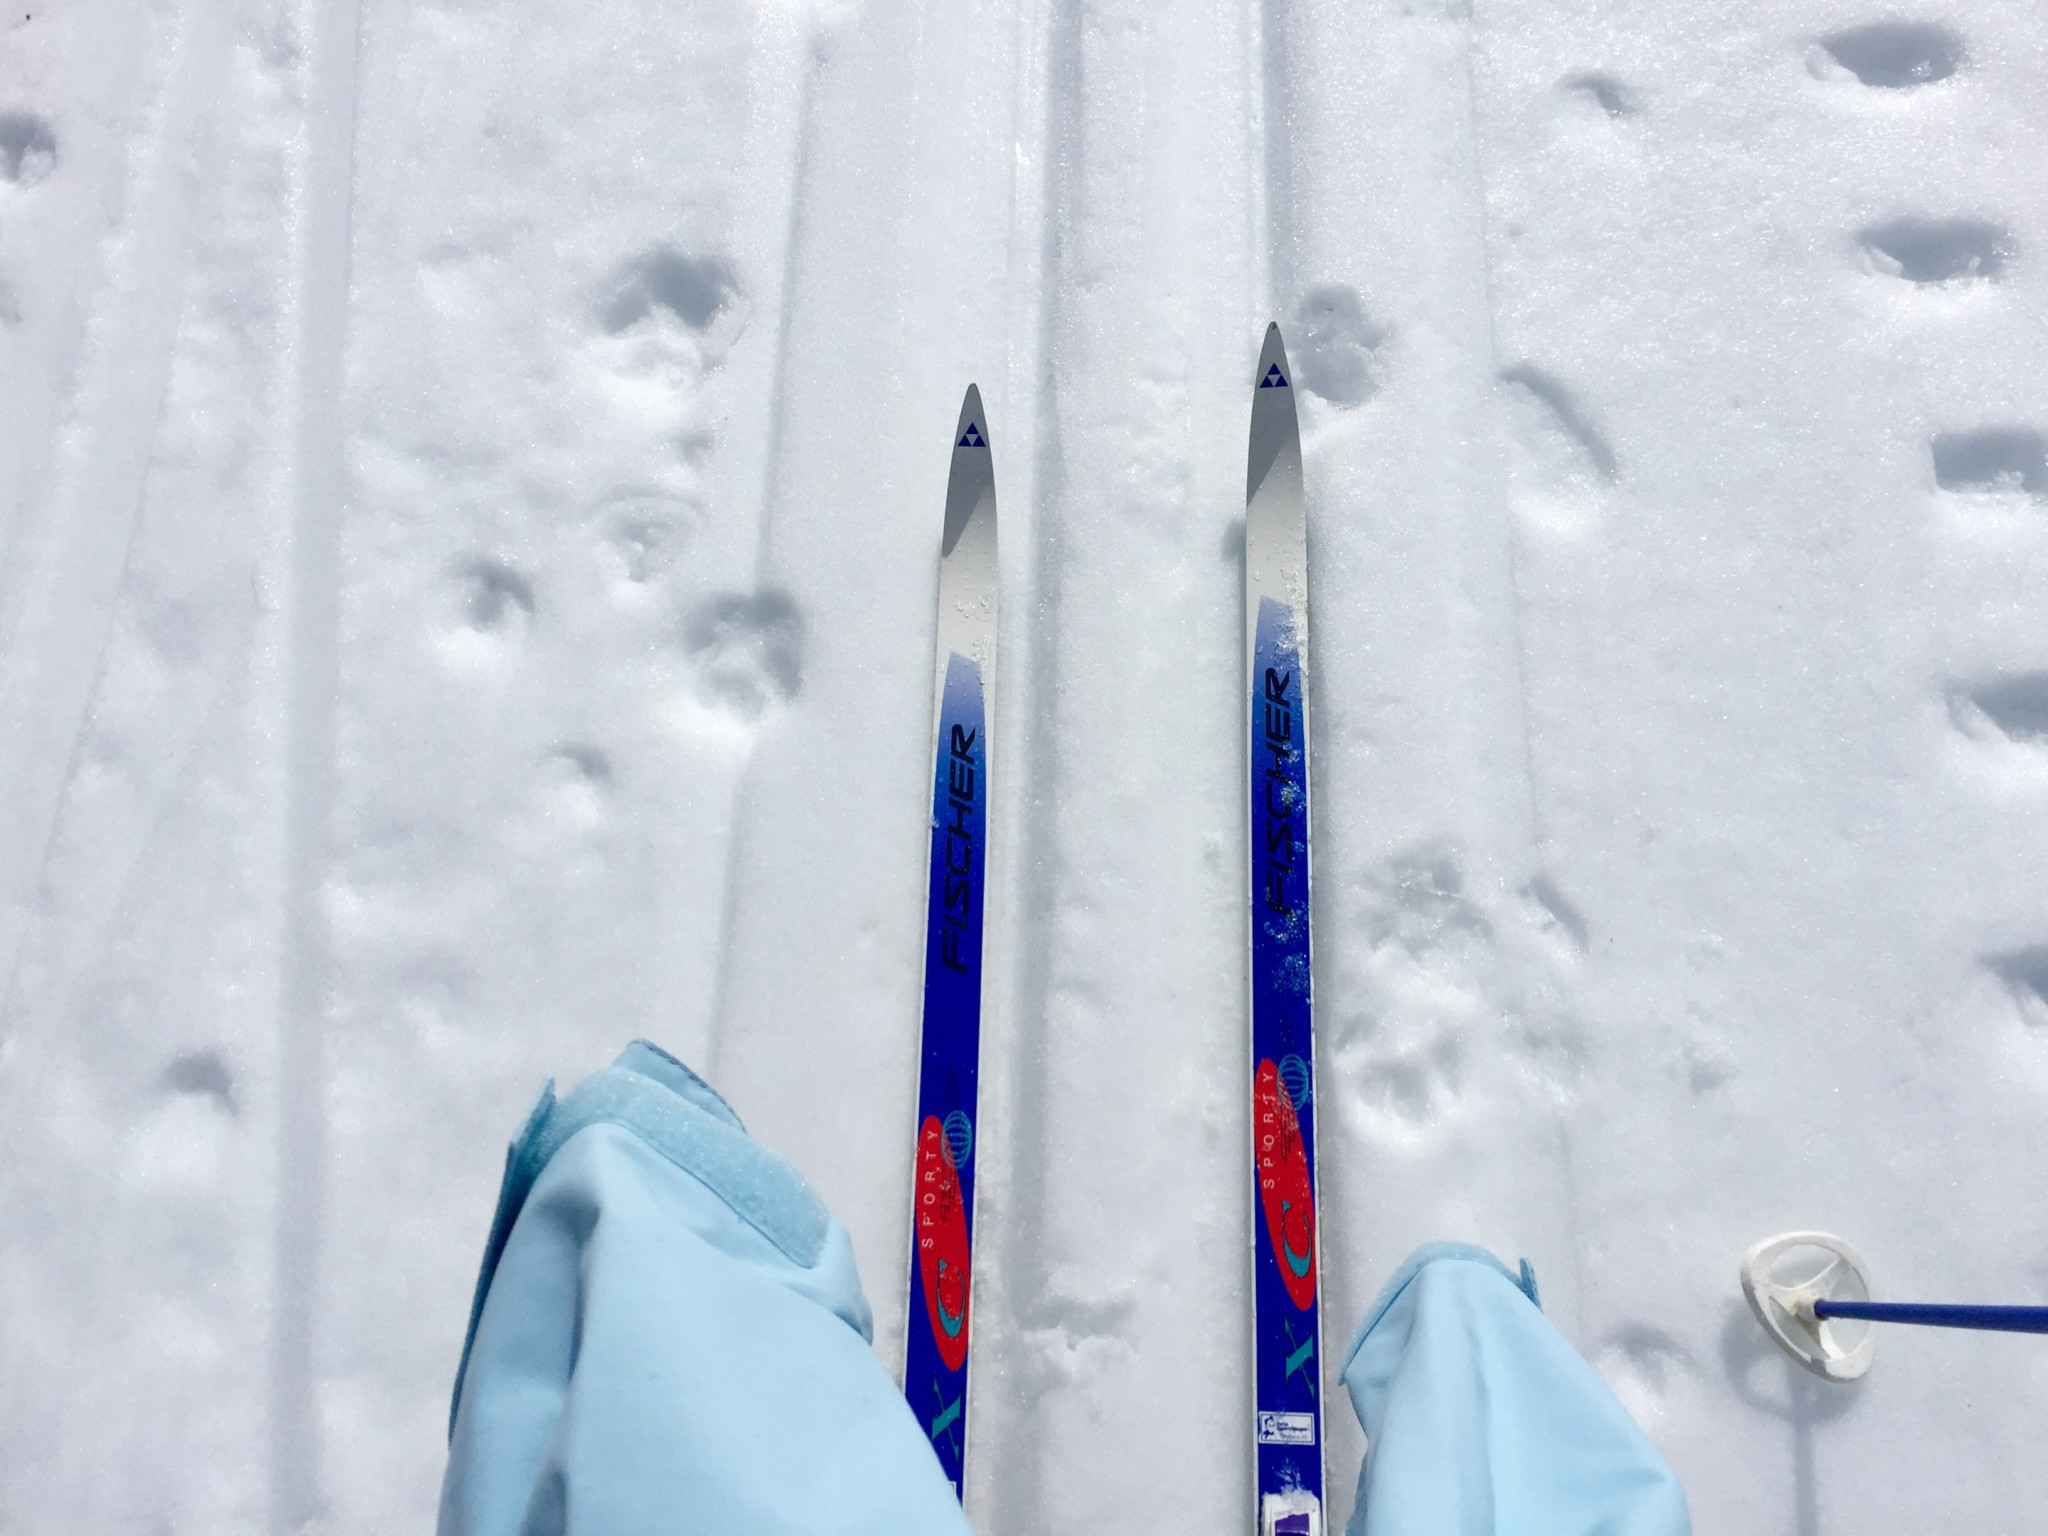 gamle-ski-ny-jakke-cross-country